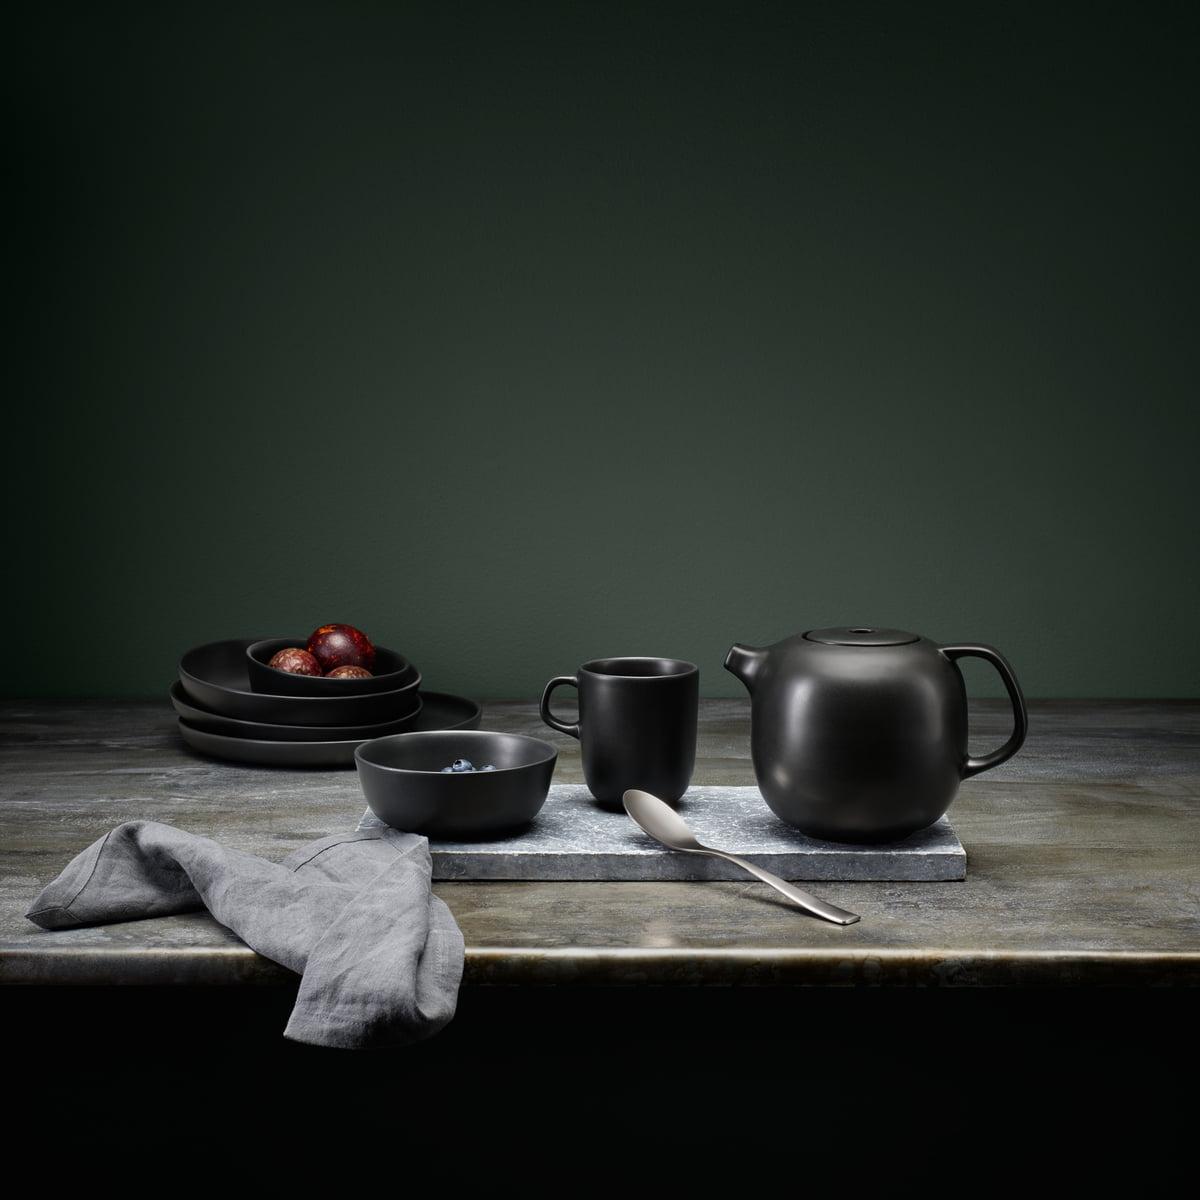 nordic kitchen teekanne von eva solo connox. Black Bedroom Furniture Sets. Home Design Ideas